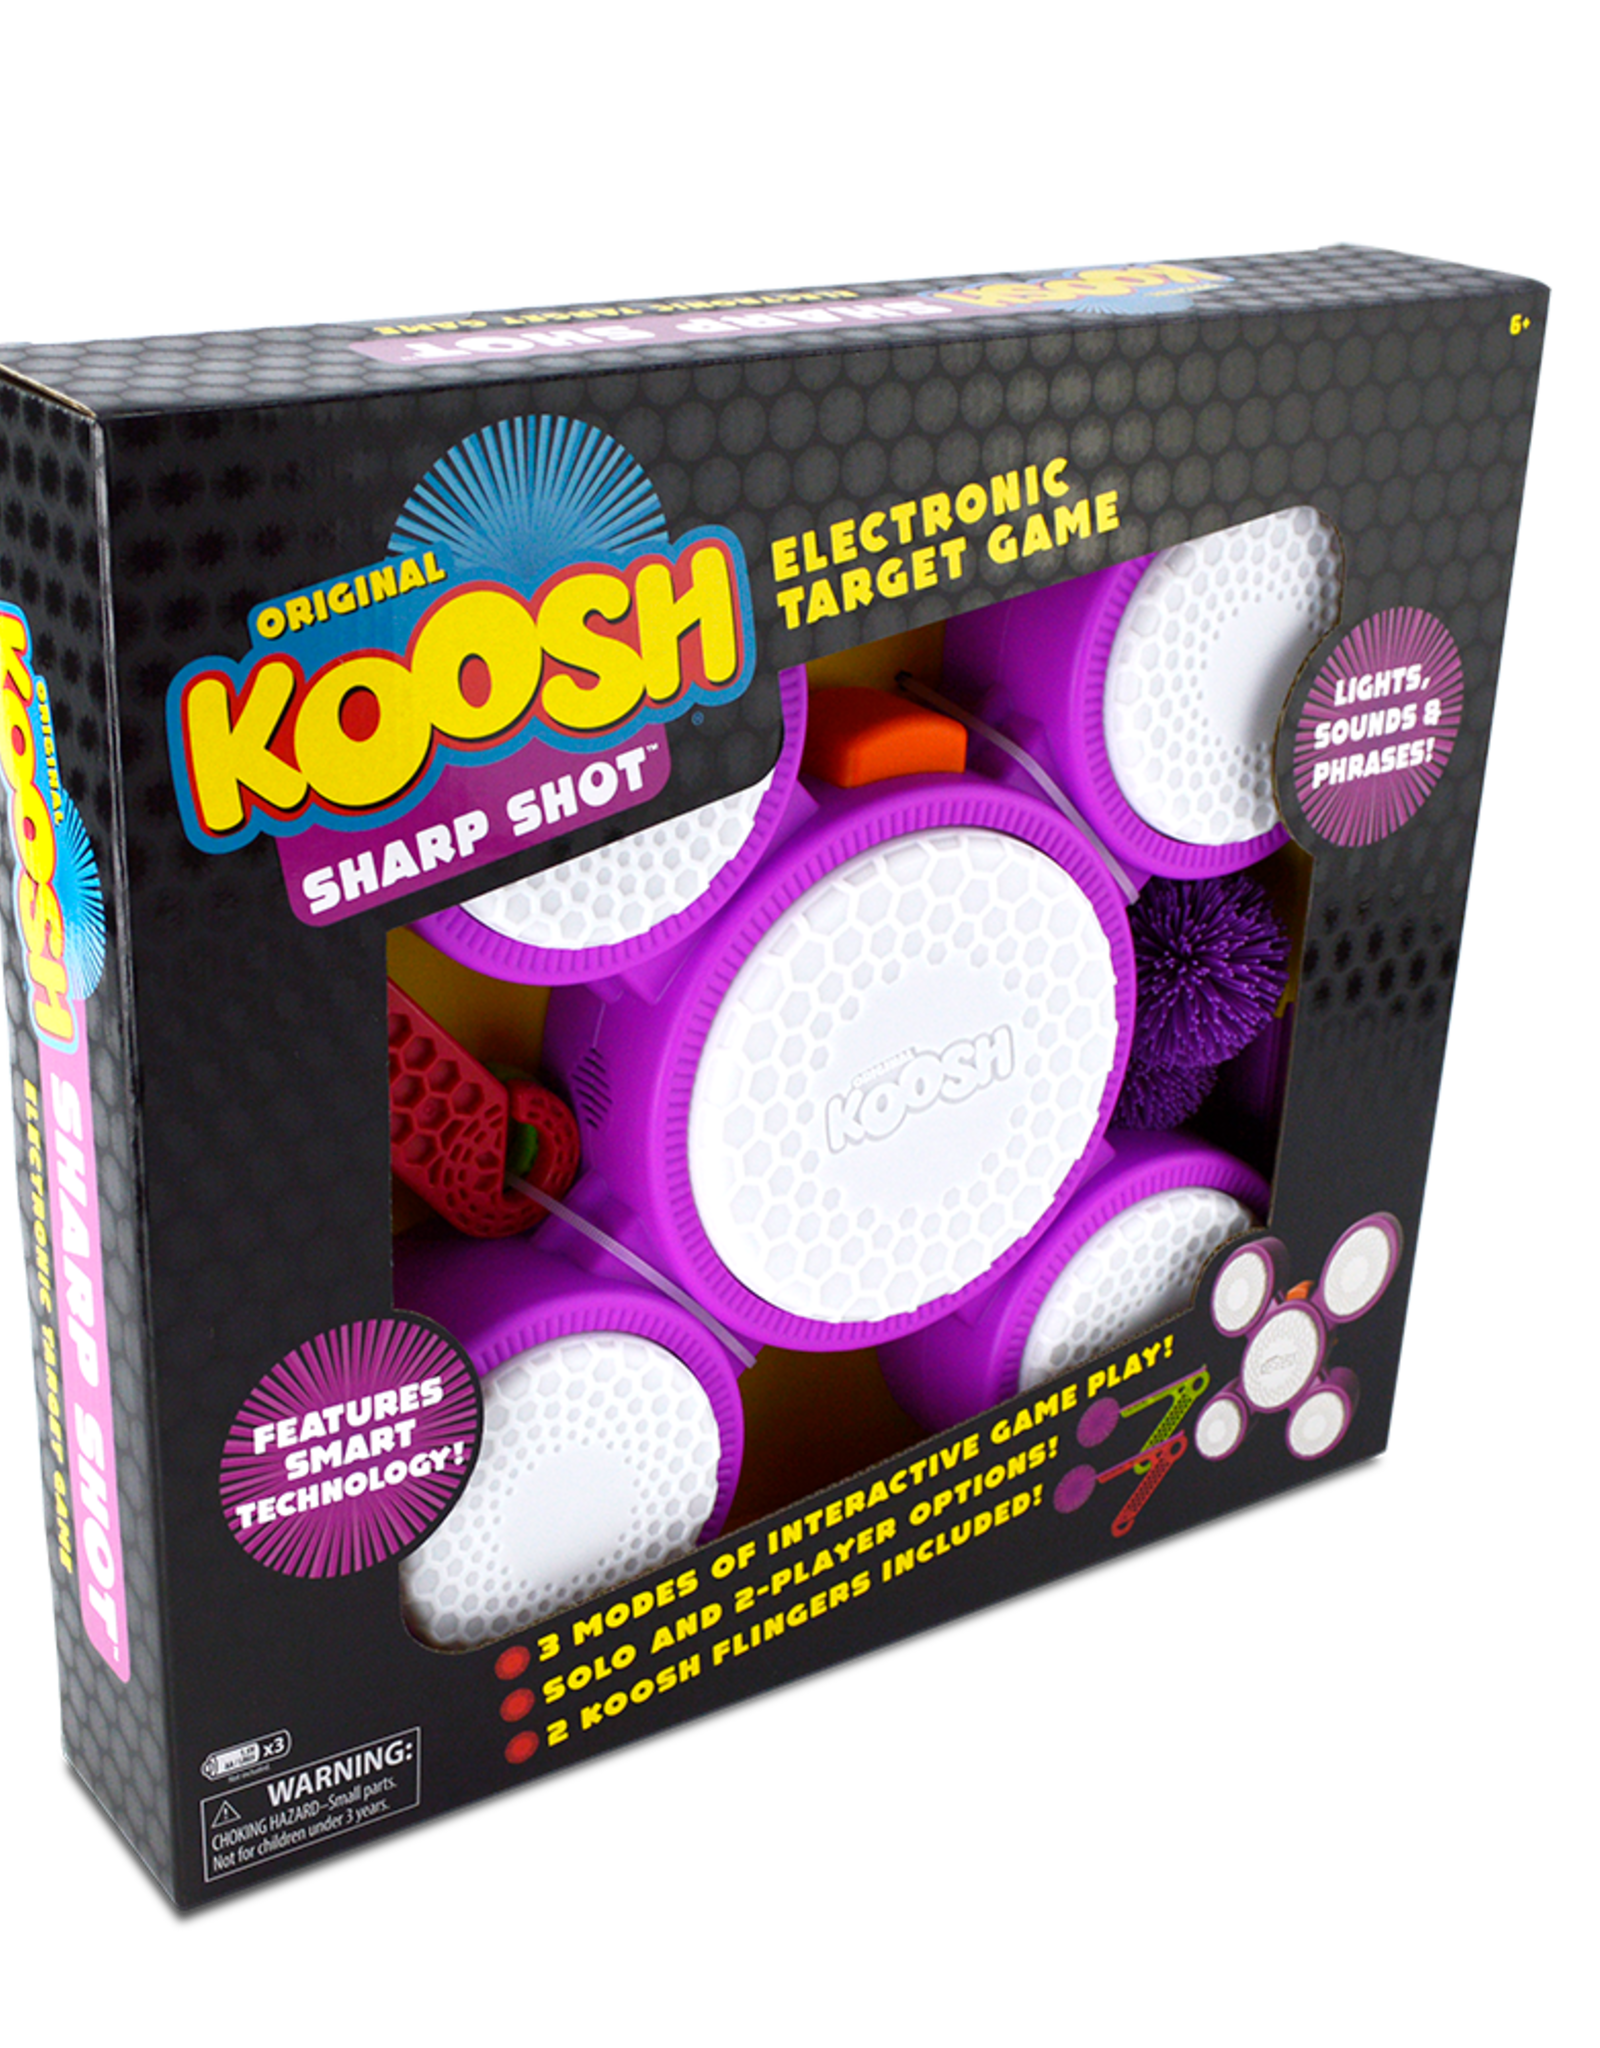 Original Koosh® Sharp Shot™ Game